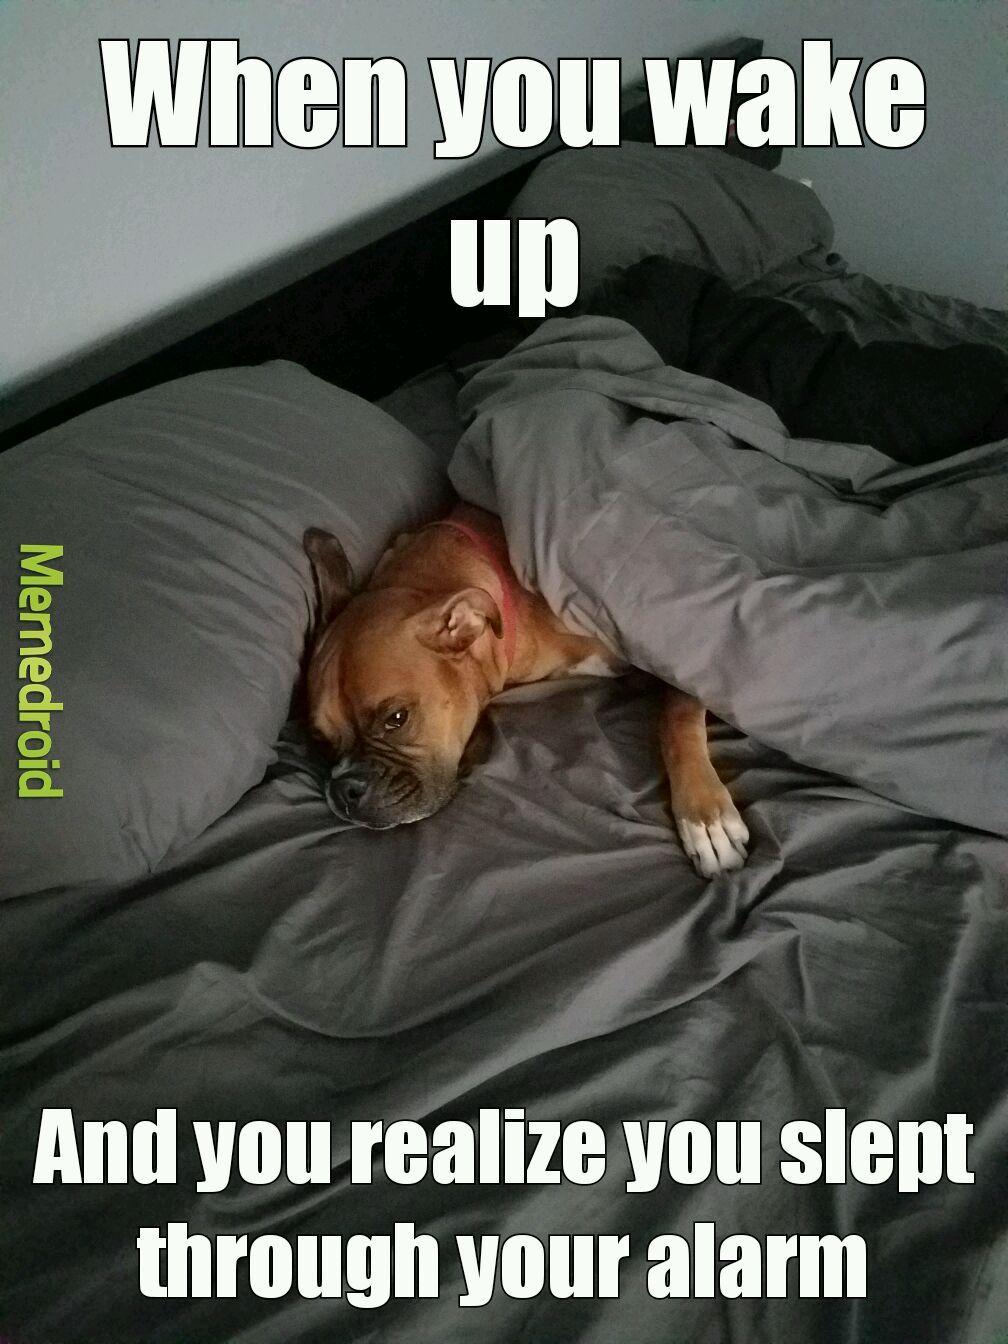 Sleep sweet prince - meme